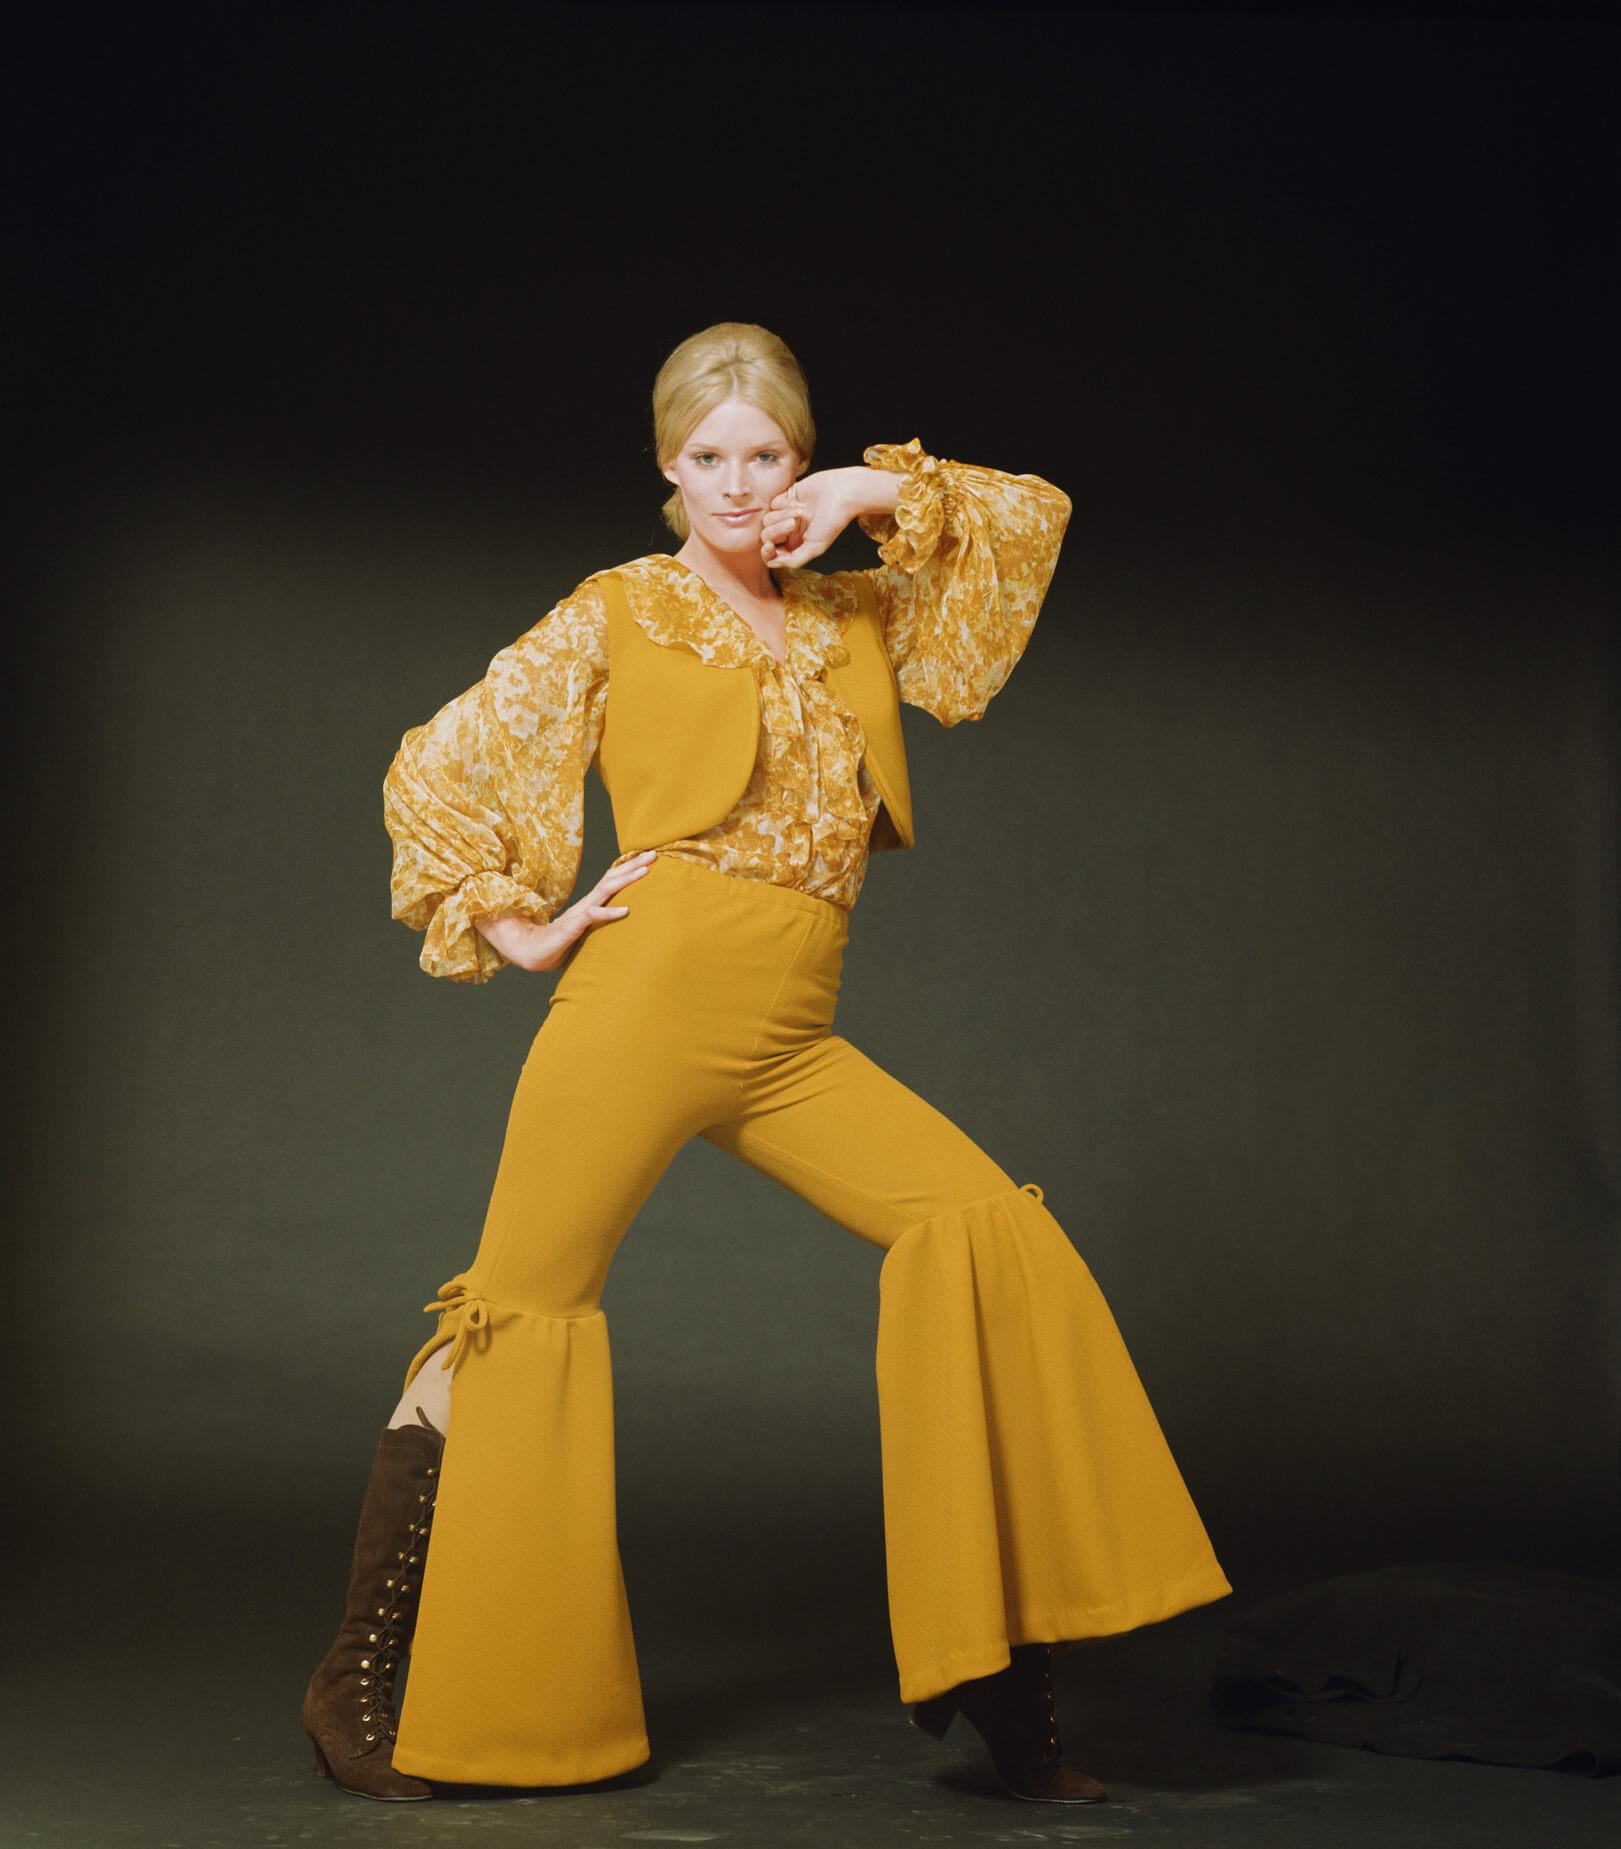 Винтажная мода: тренды 70-х, которые актуальны сегодня-Фото 5